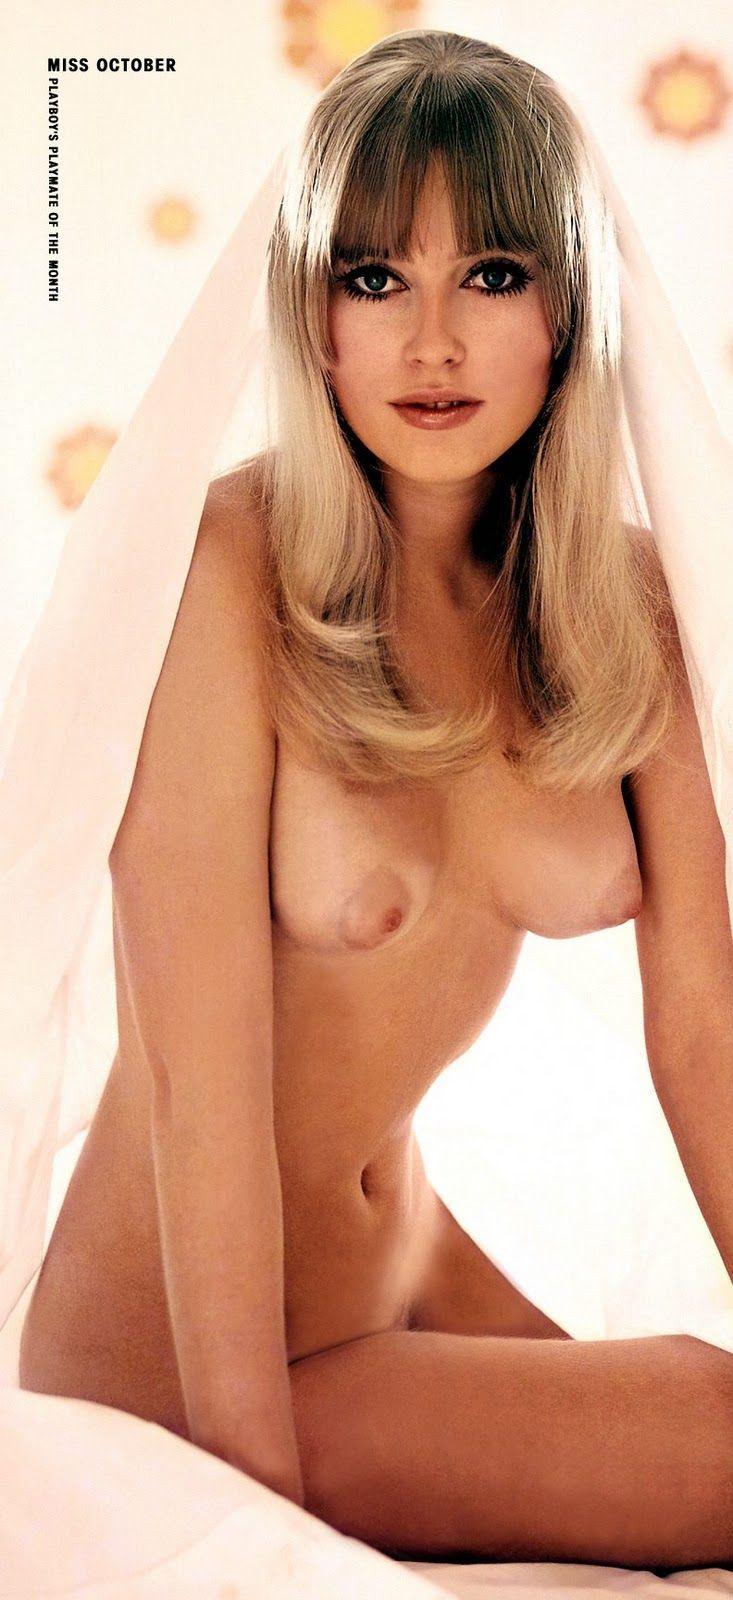 Playboy  Porn Video Playlist from qbex6388  Pornhubcom